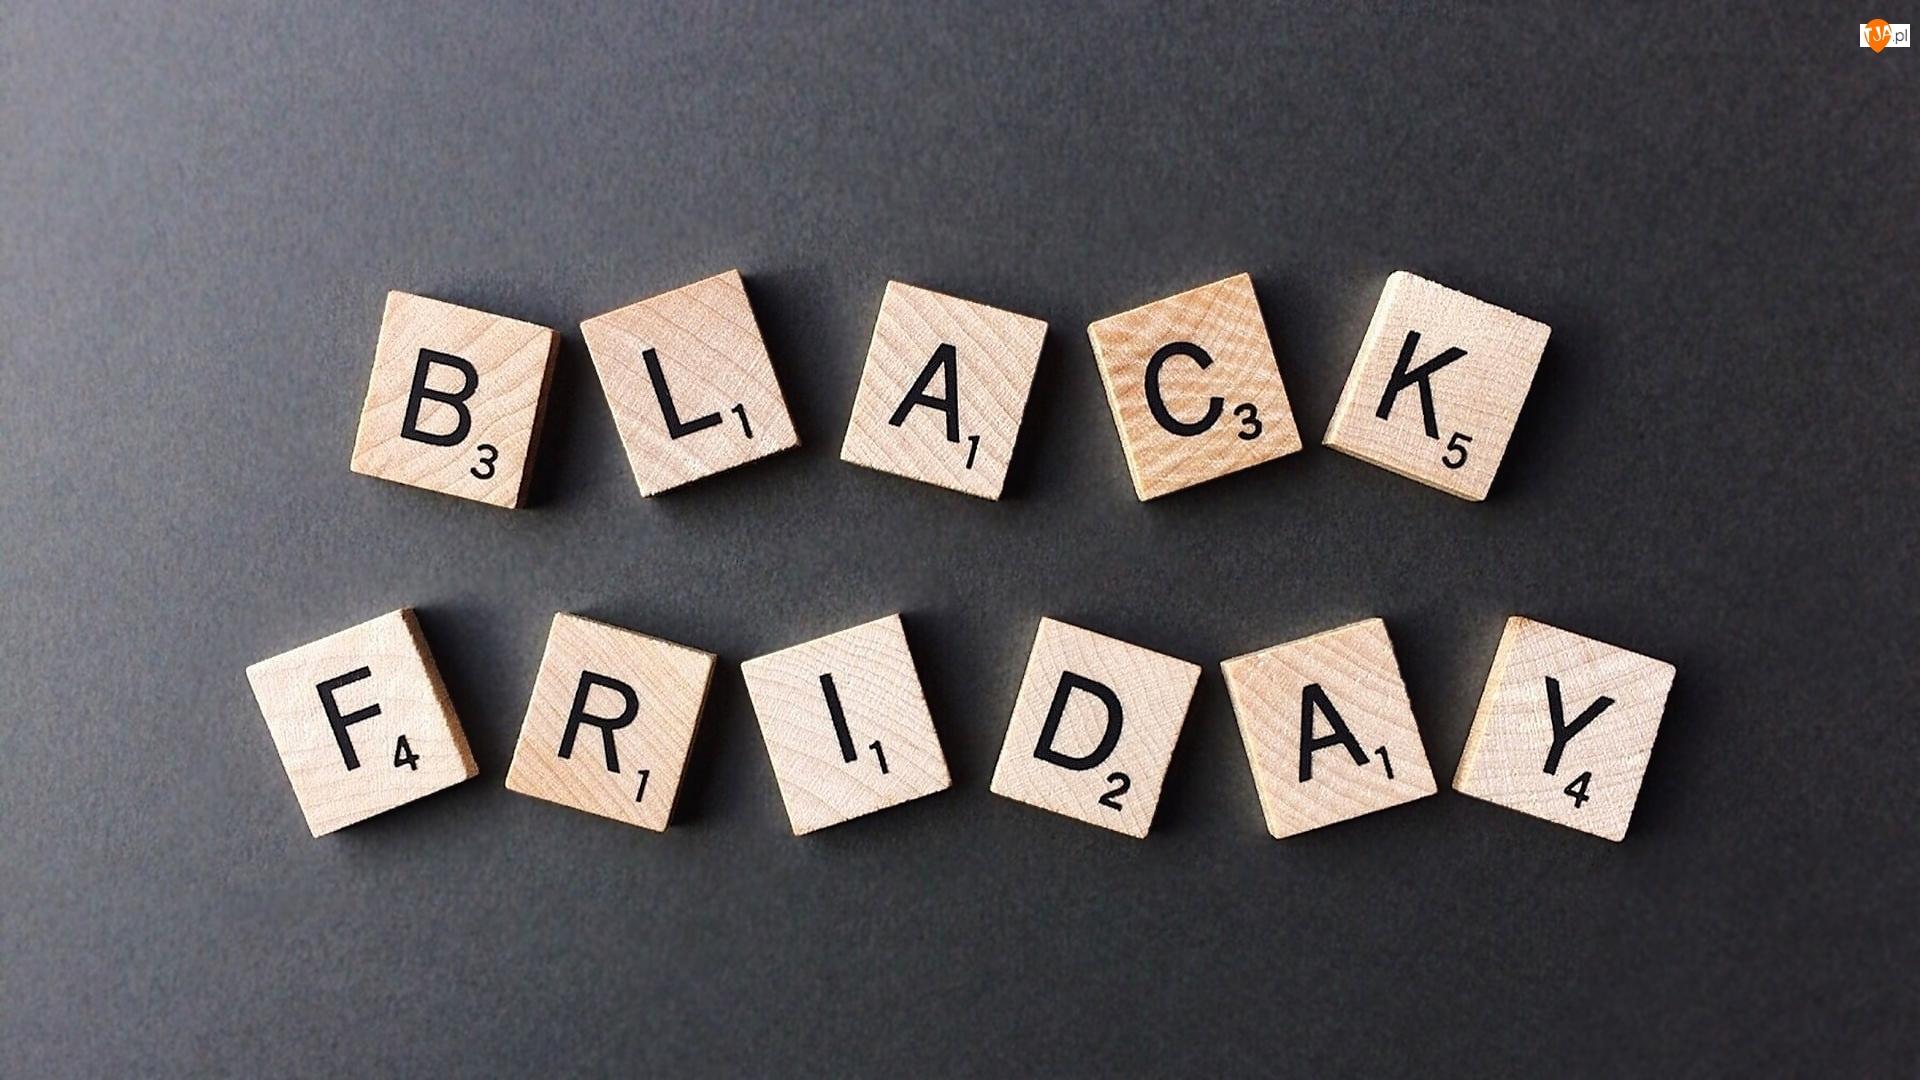 Black Friday, Tło, Napis, Scrabble, Ciemne